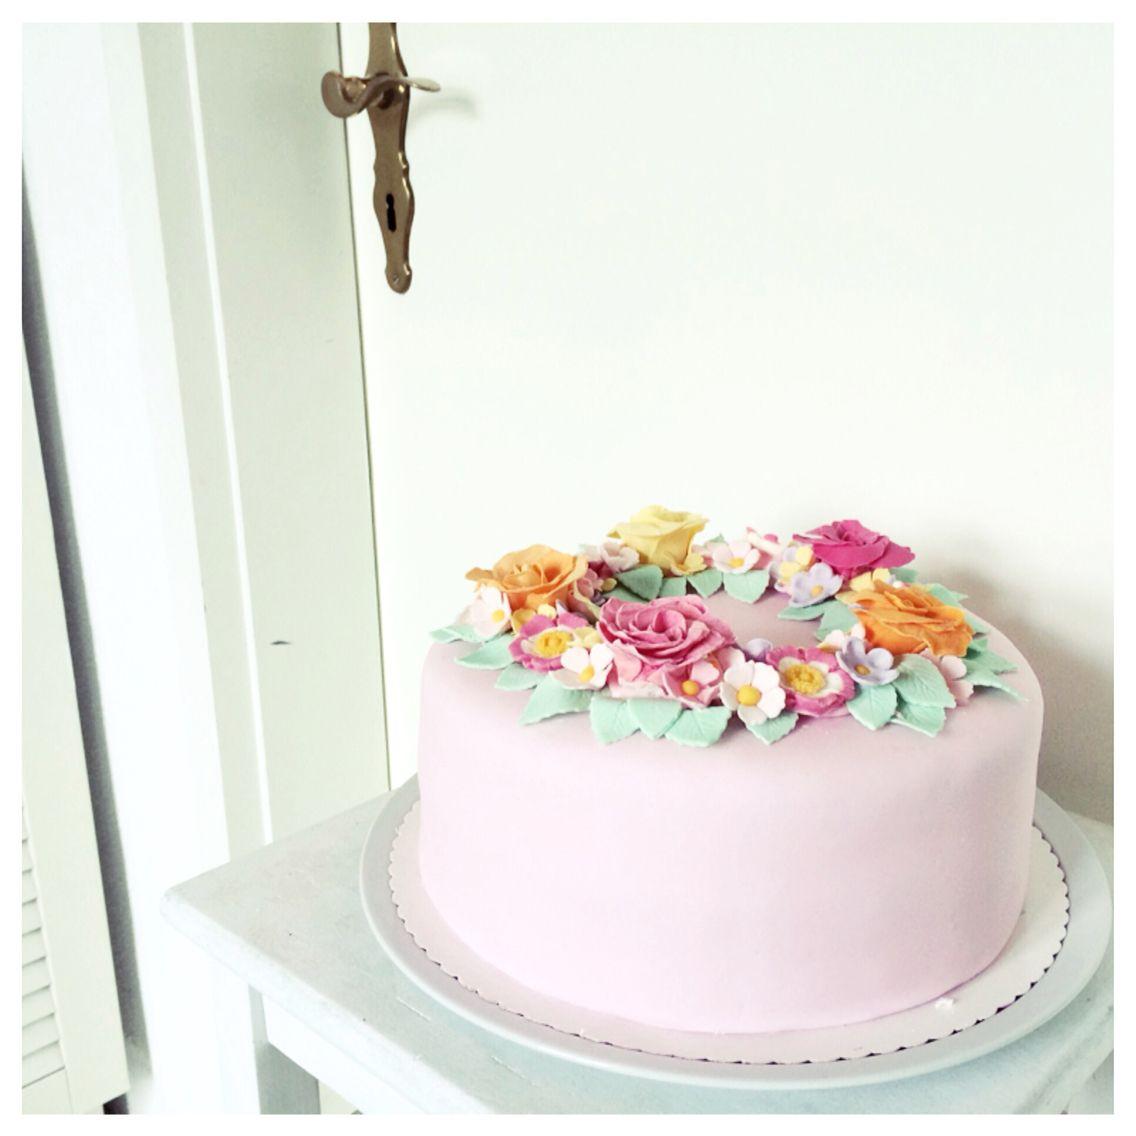 Hellrosa Fondant torte mit Pastell Blüten